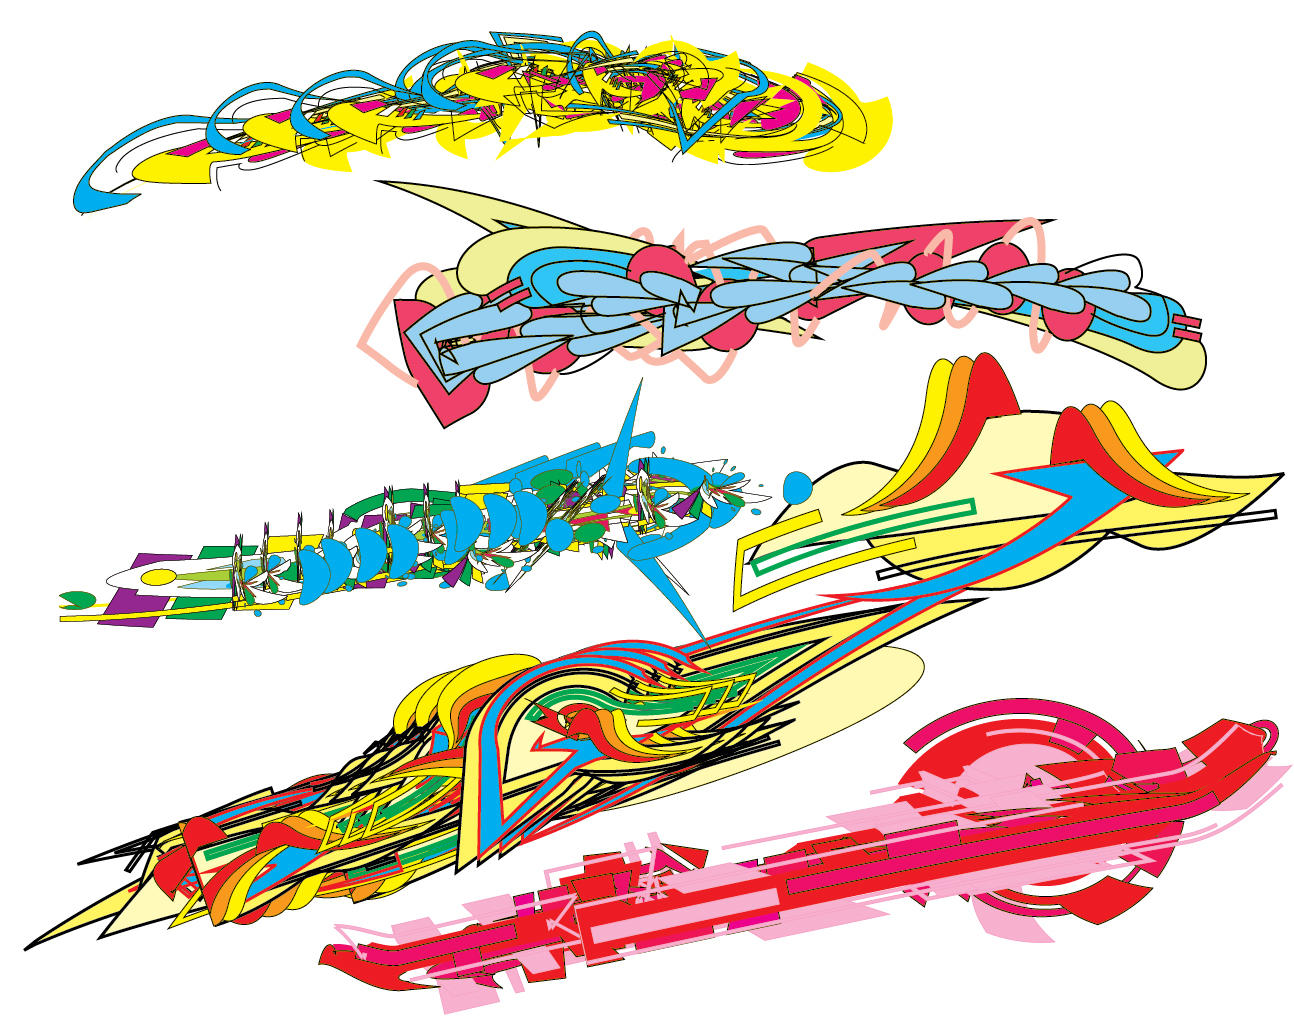 junk paris illustrator brushes by junkparis